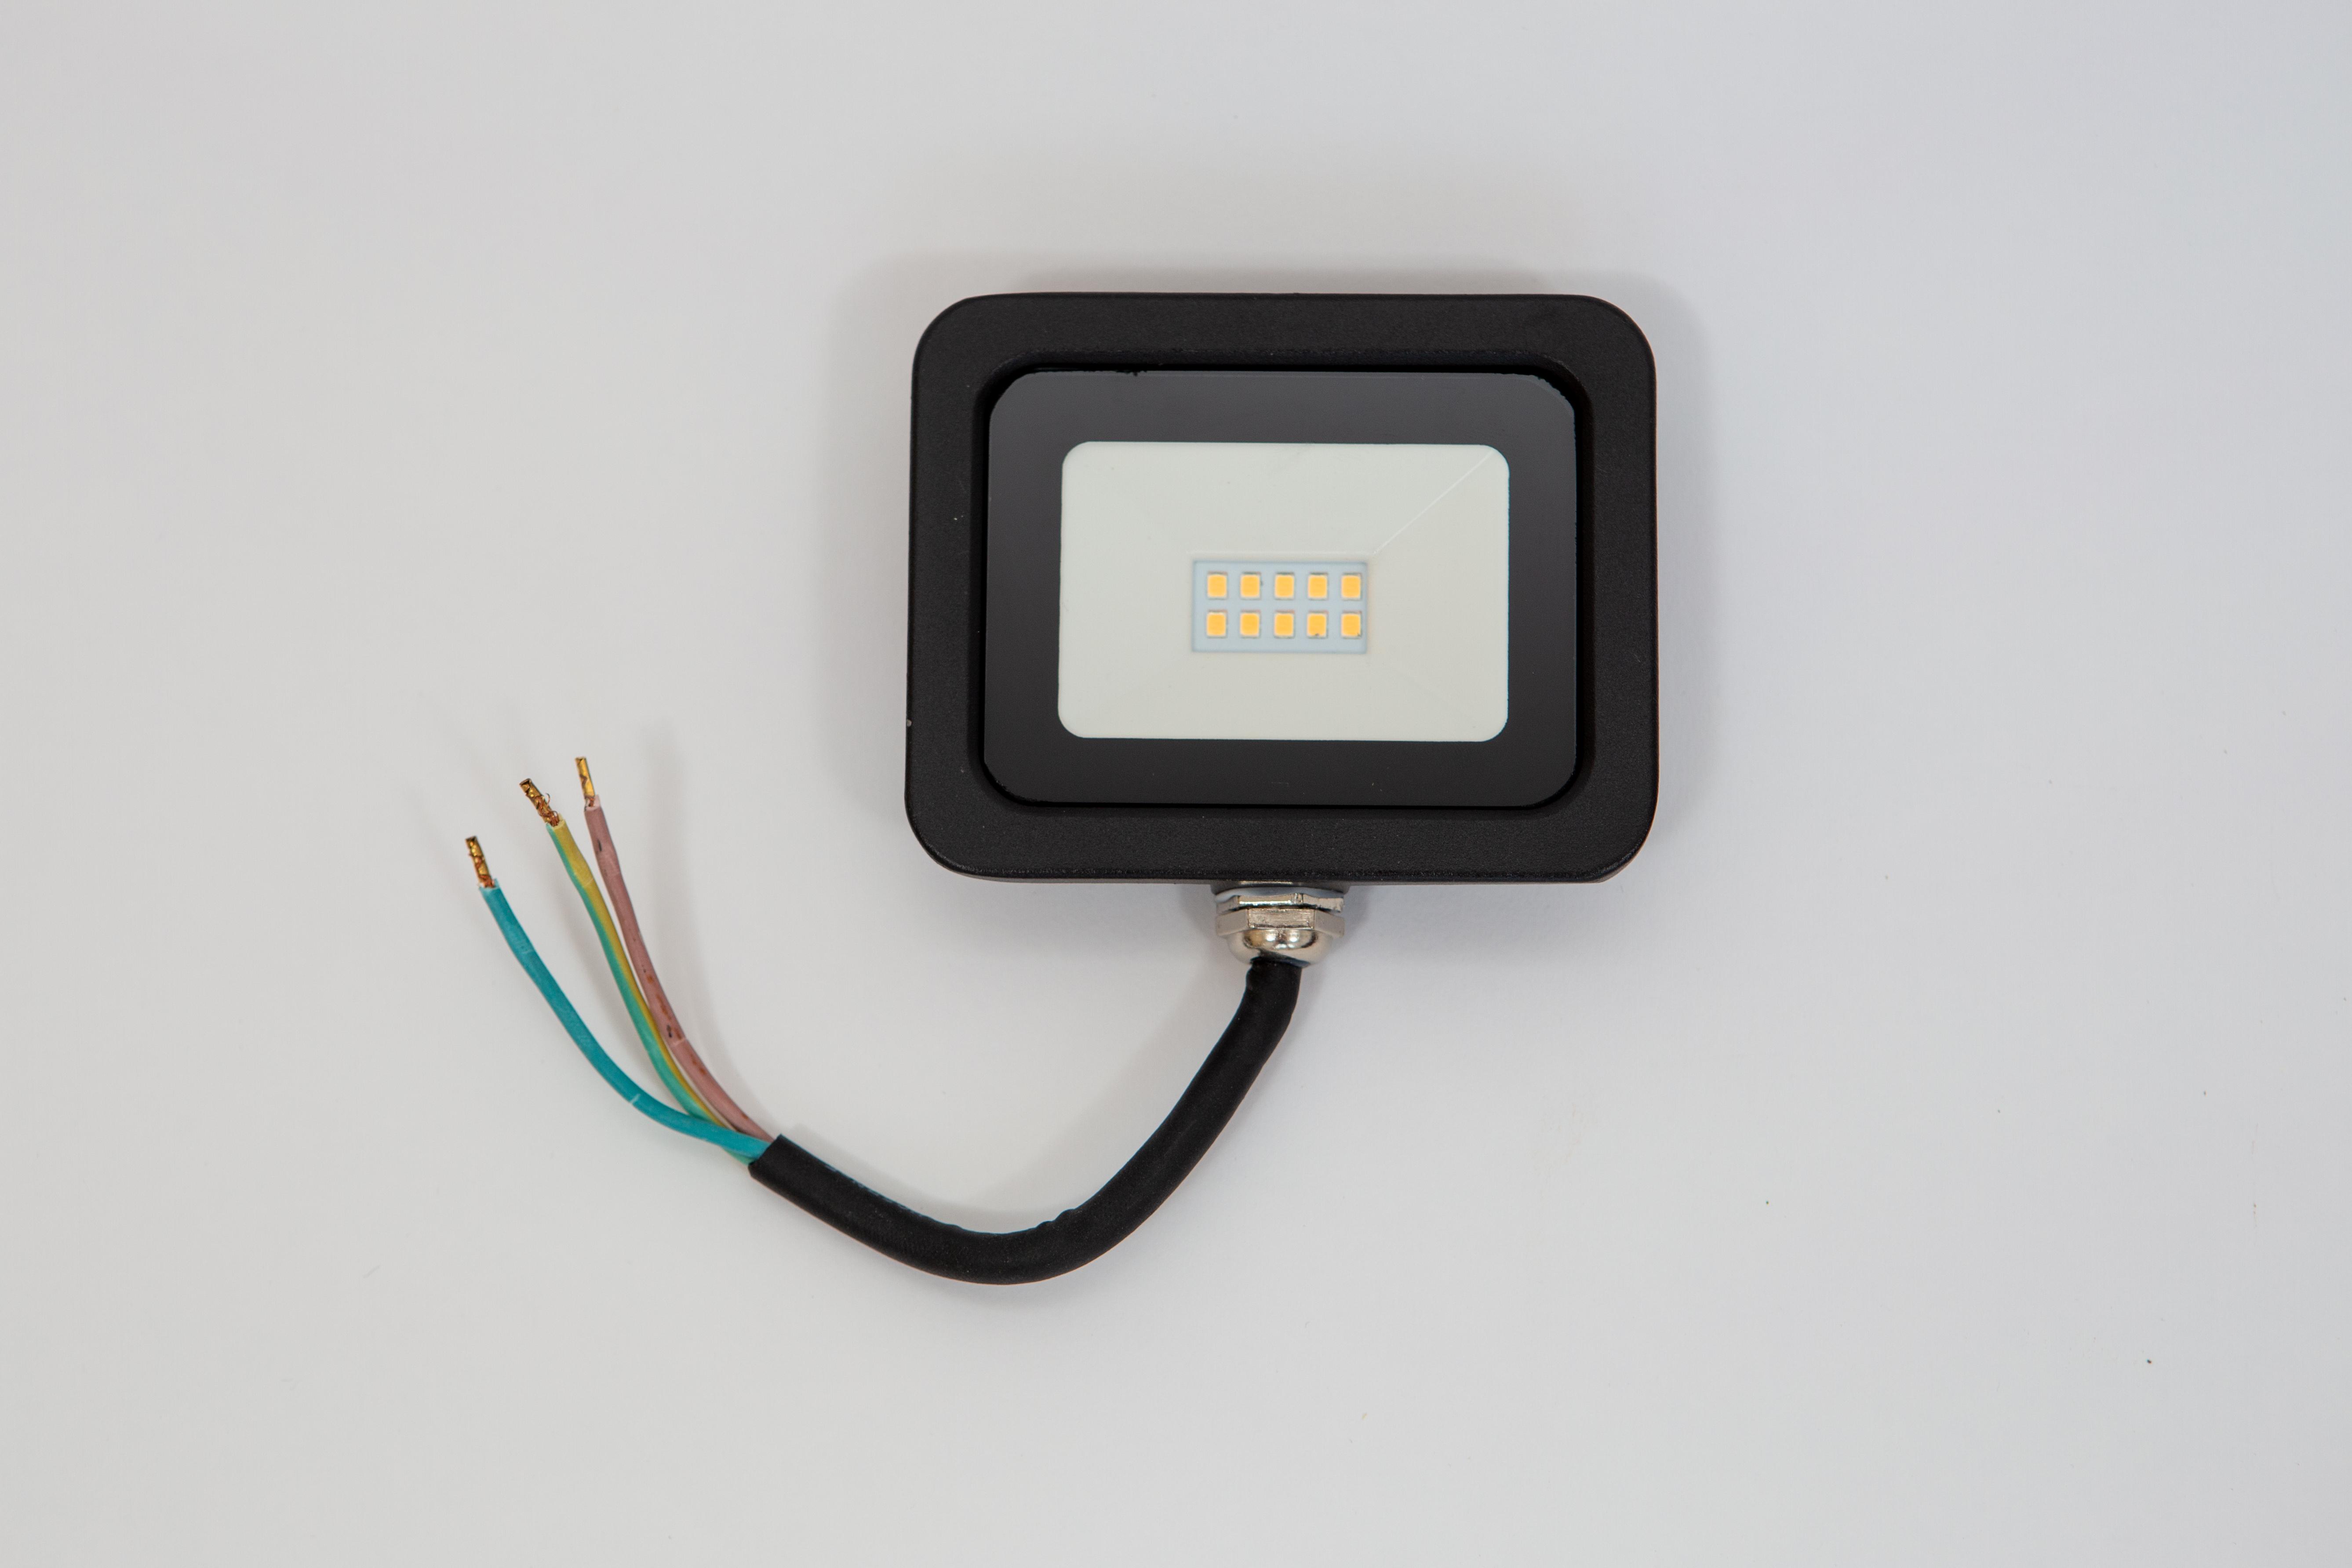 Proiector led 10 w lumina rece,810 lm, ( 6000 k ), IP 65 , 230 v,clasa a++,carcasa aluminiu negru [0]